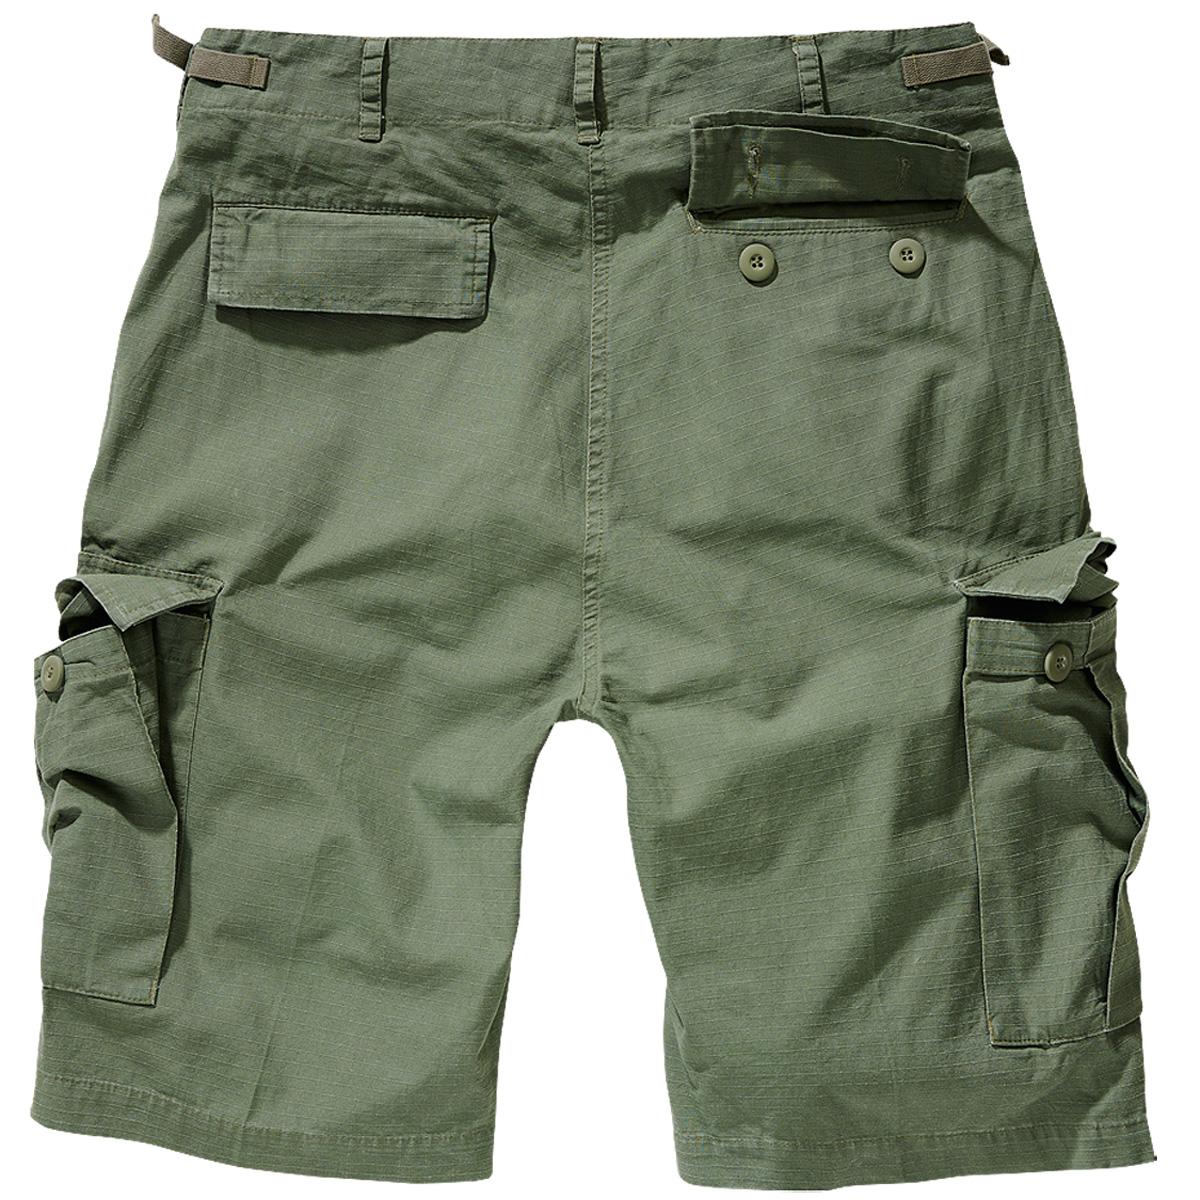 Brandit-BDU-Ripstop-Shorts-S-7XL-Army-Cargo-Bermuda-Outdoor-Short-kurze-Hose miniatura 5